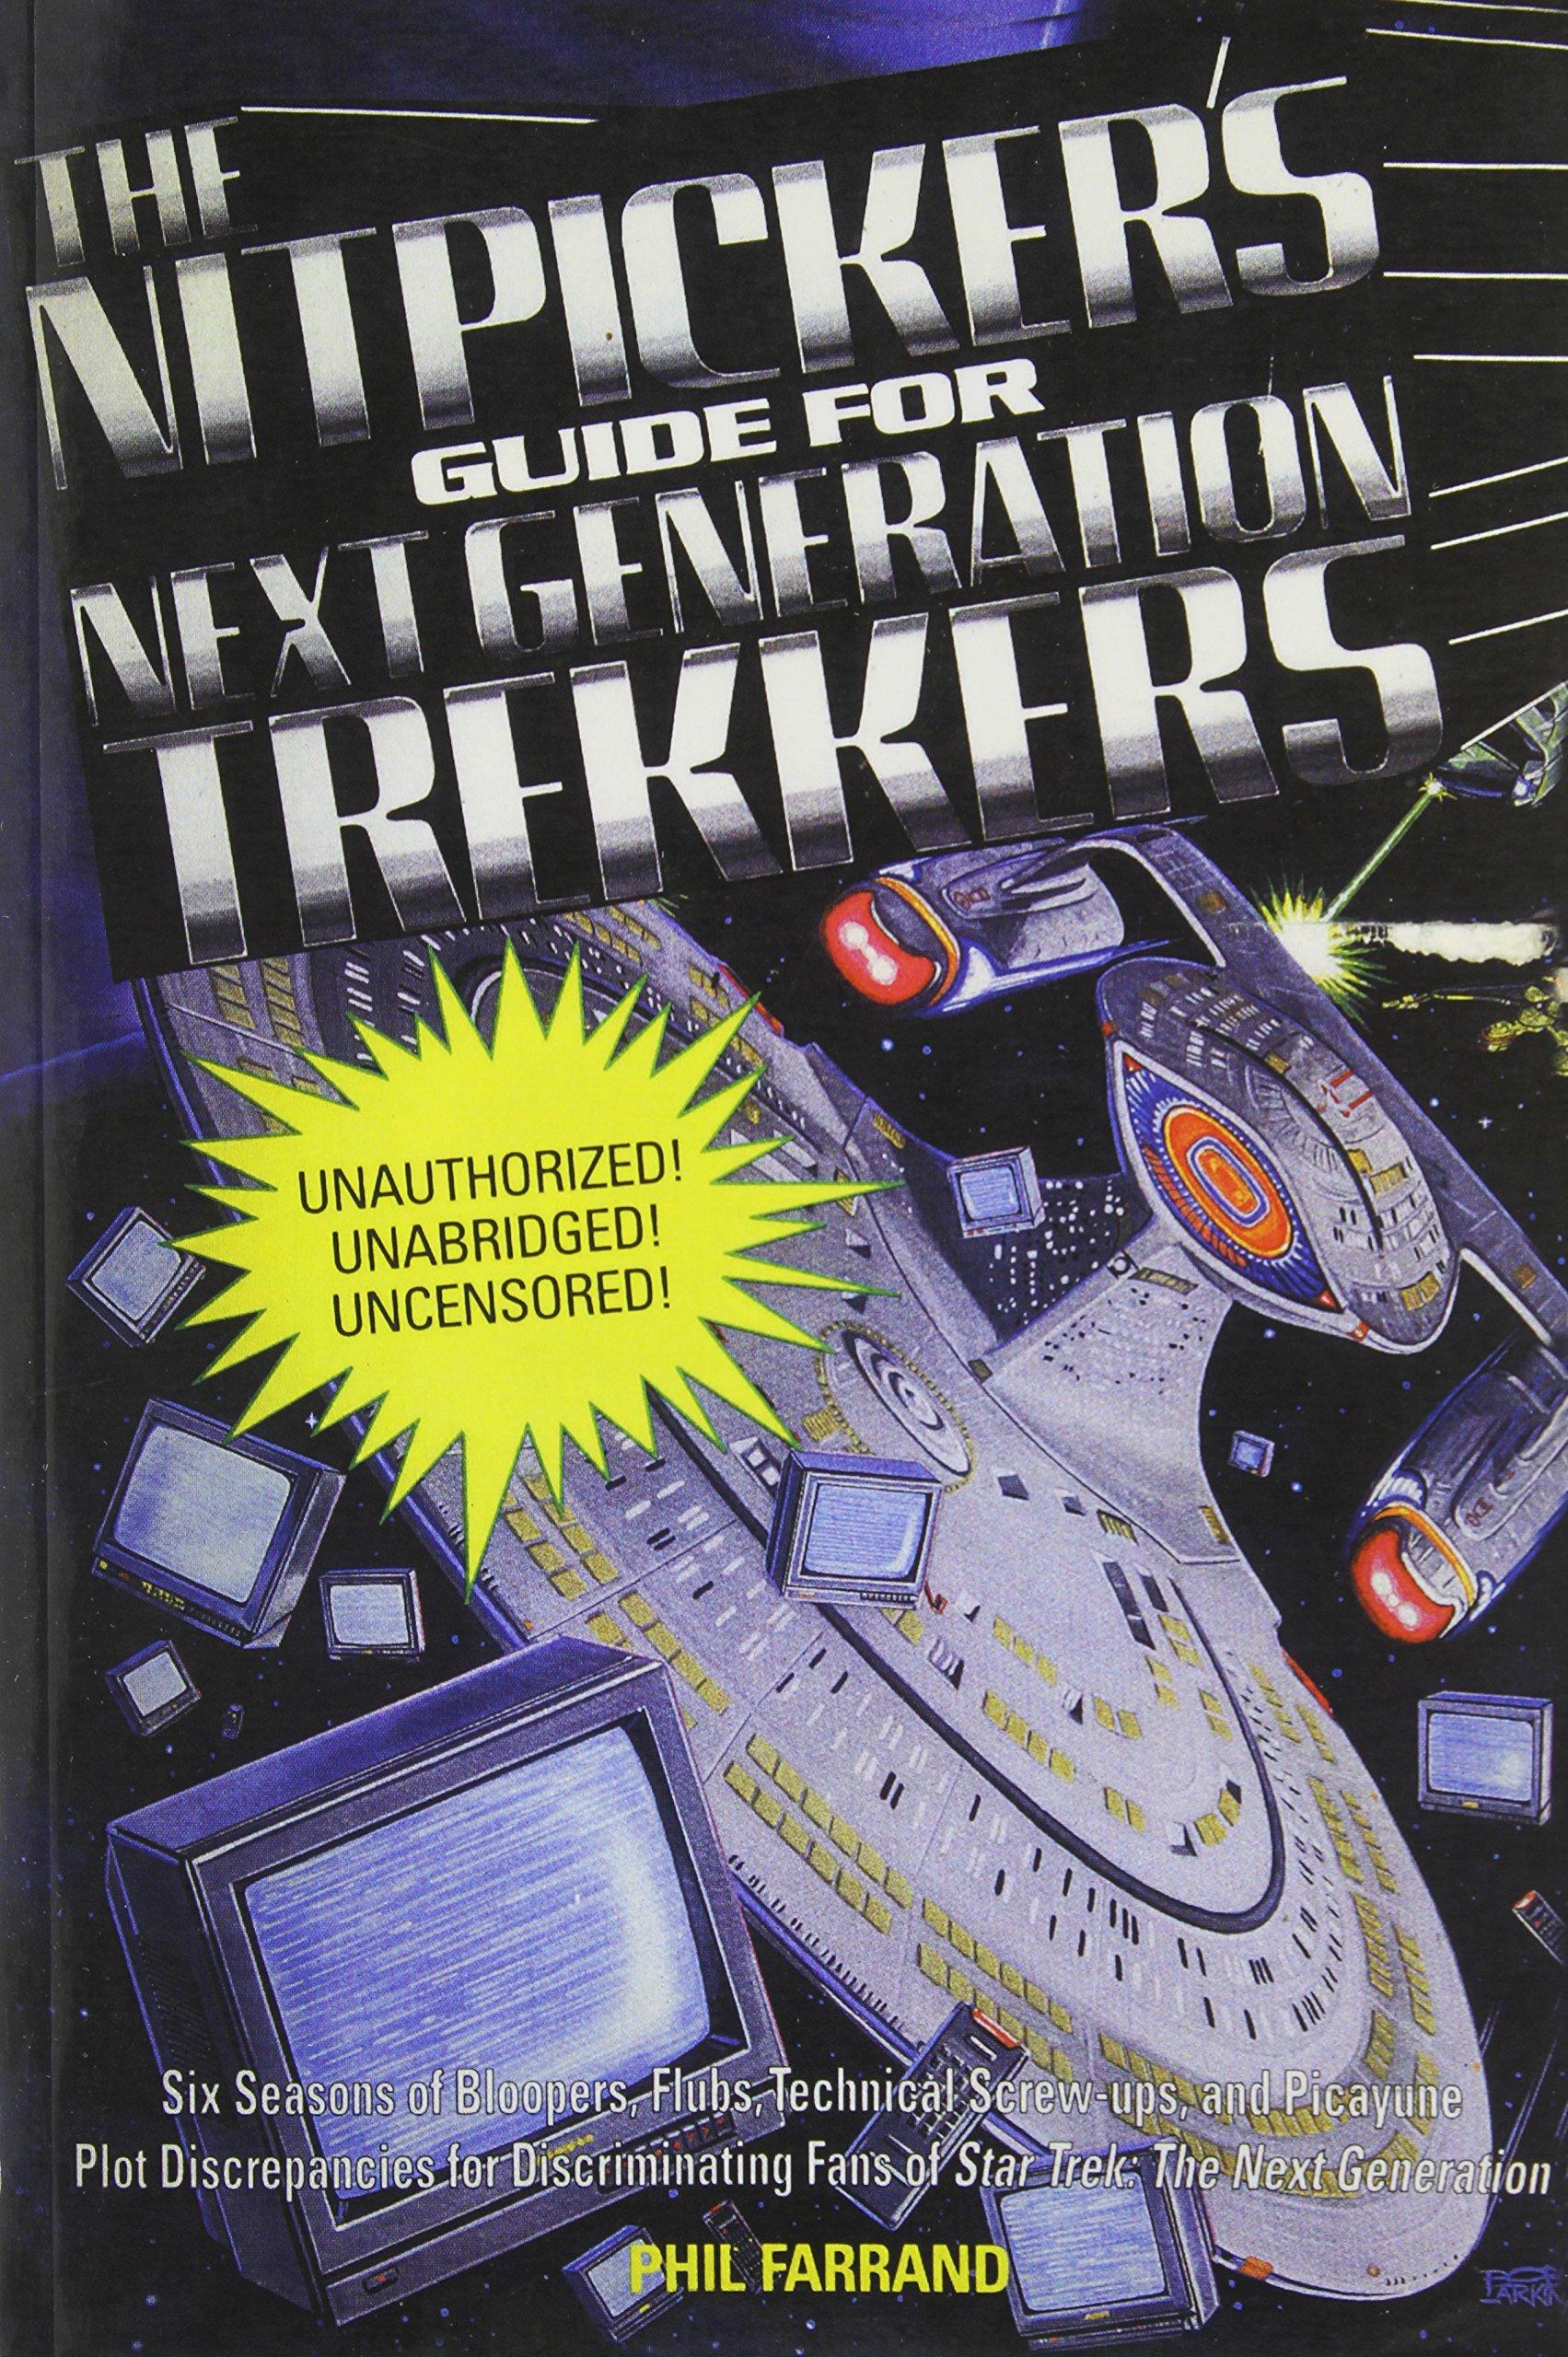 The Nitpickers Guide for Next Generation Trekkers.jpg